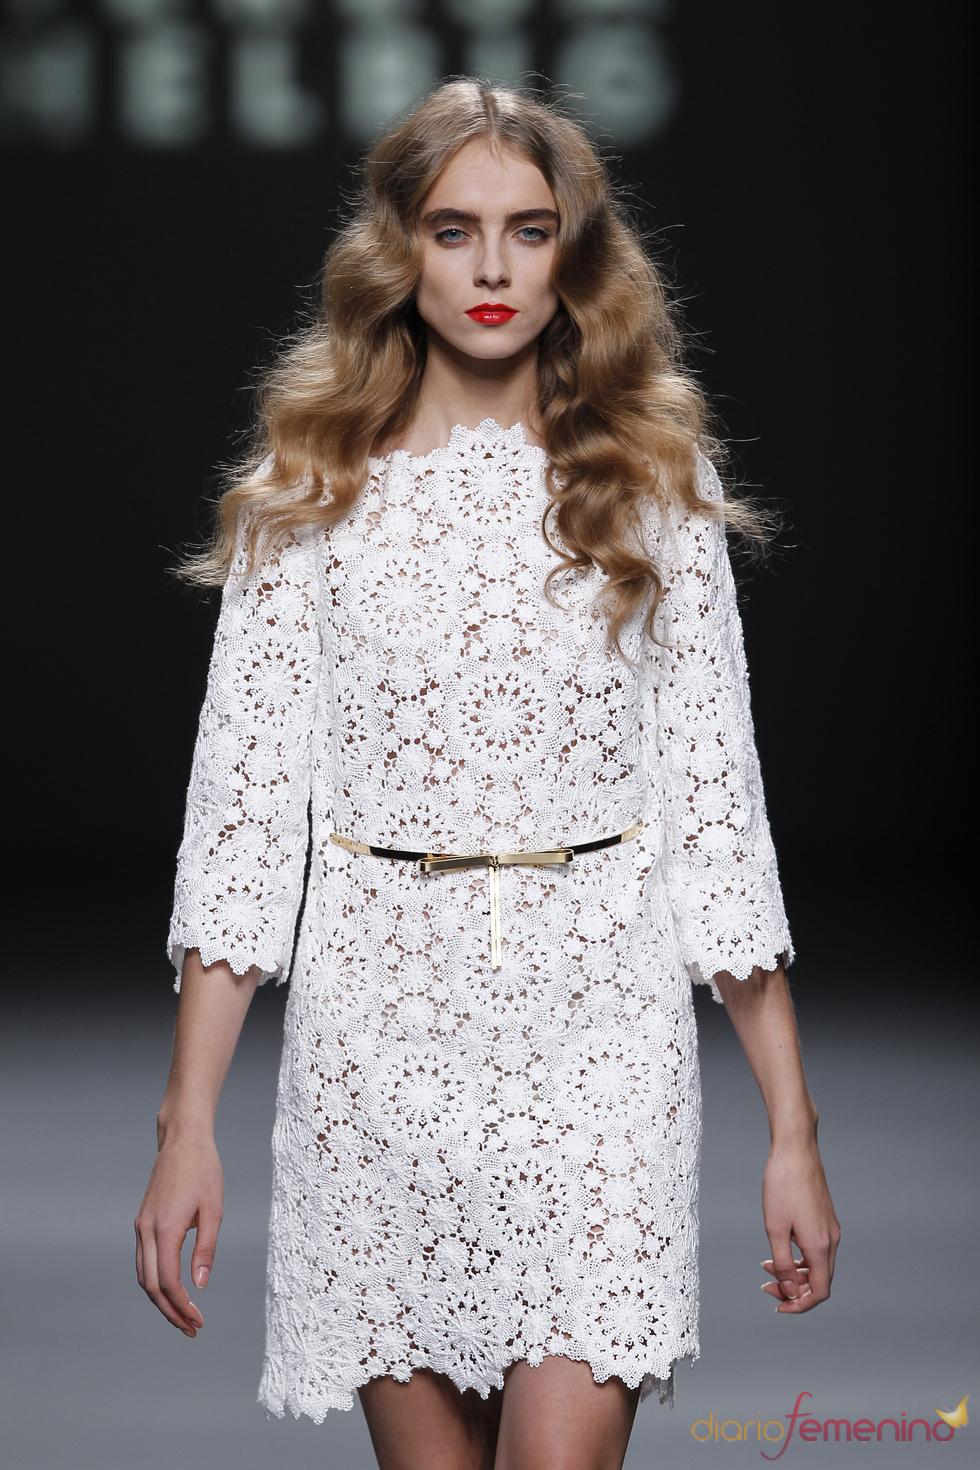 Vestido de encaje blanco firmado por Teresa Helbig en la Madrid Fashion Week